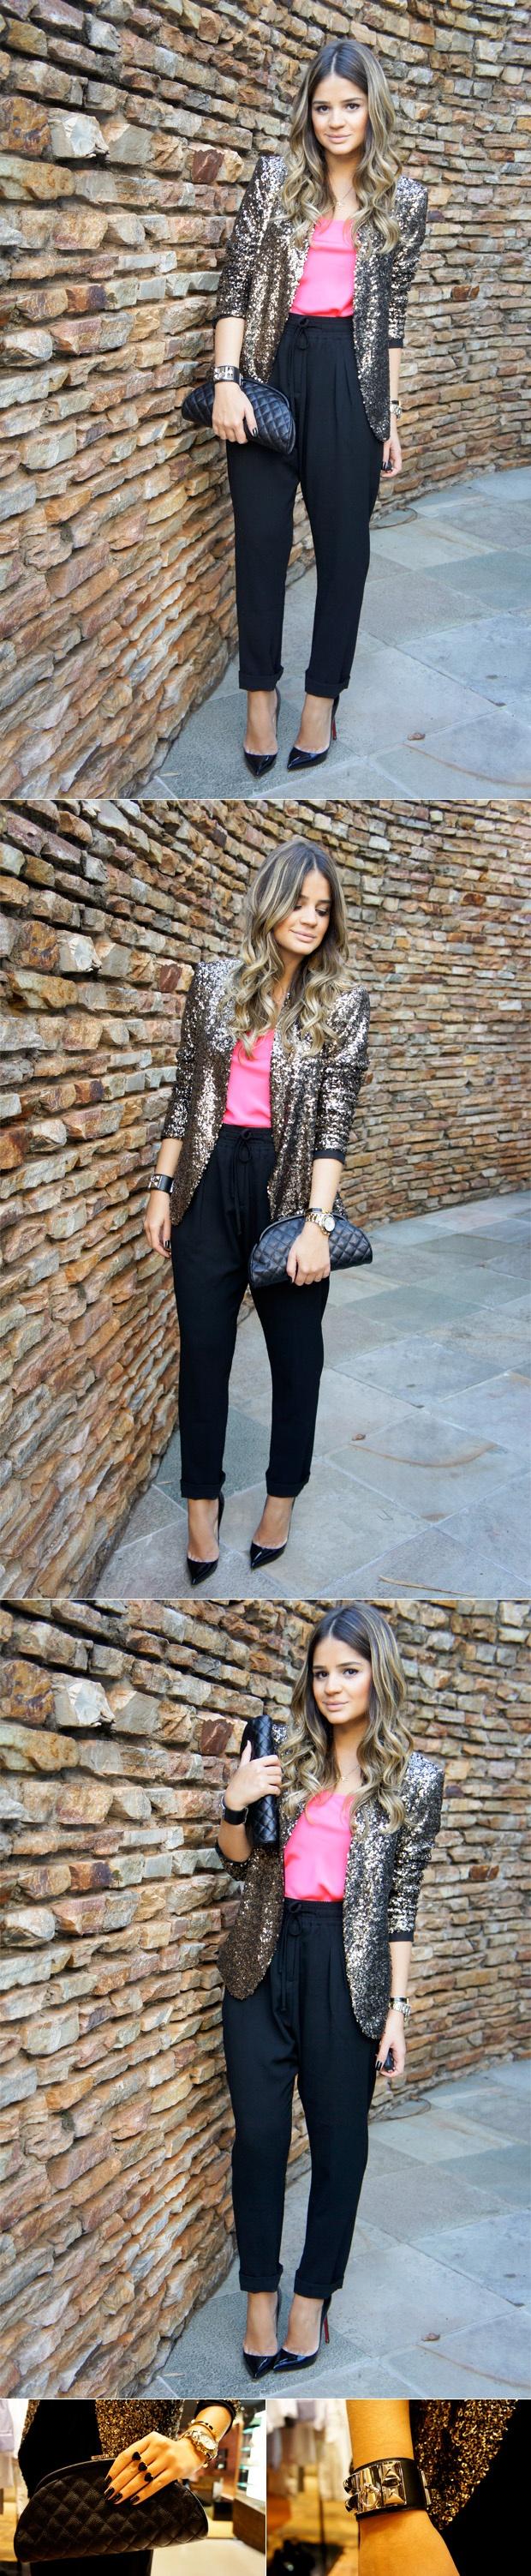 Blazer - Zara (Ju's blog) | Regatta - SUN | Pants - Chocolate | Bag - Chanel | Ring - Pri Schiavinato | Bracelet - Hermes | Pumps - Louboutin